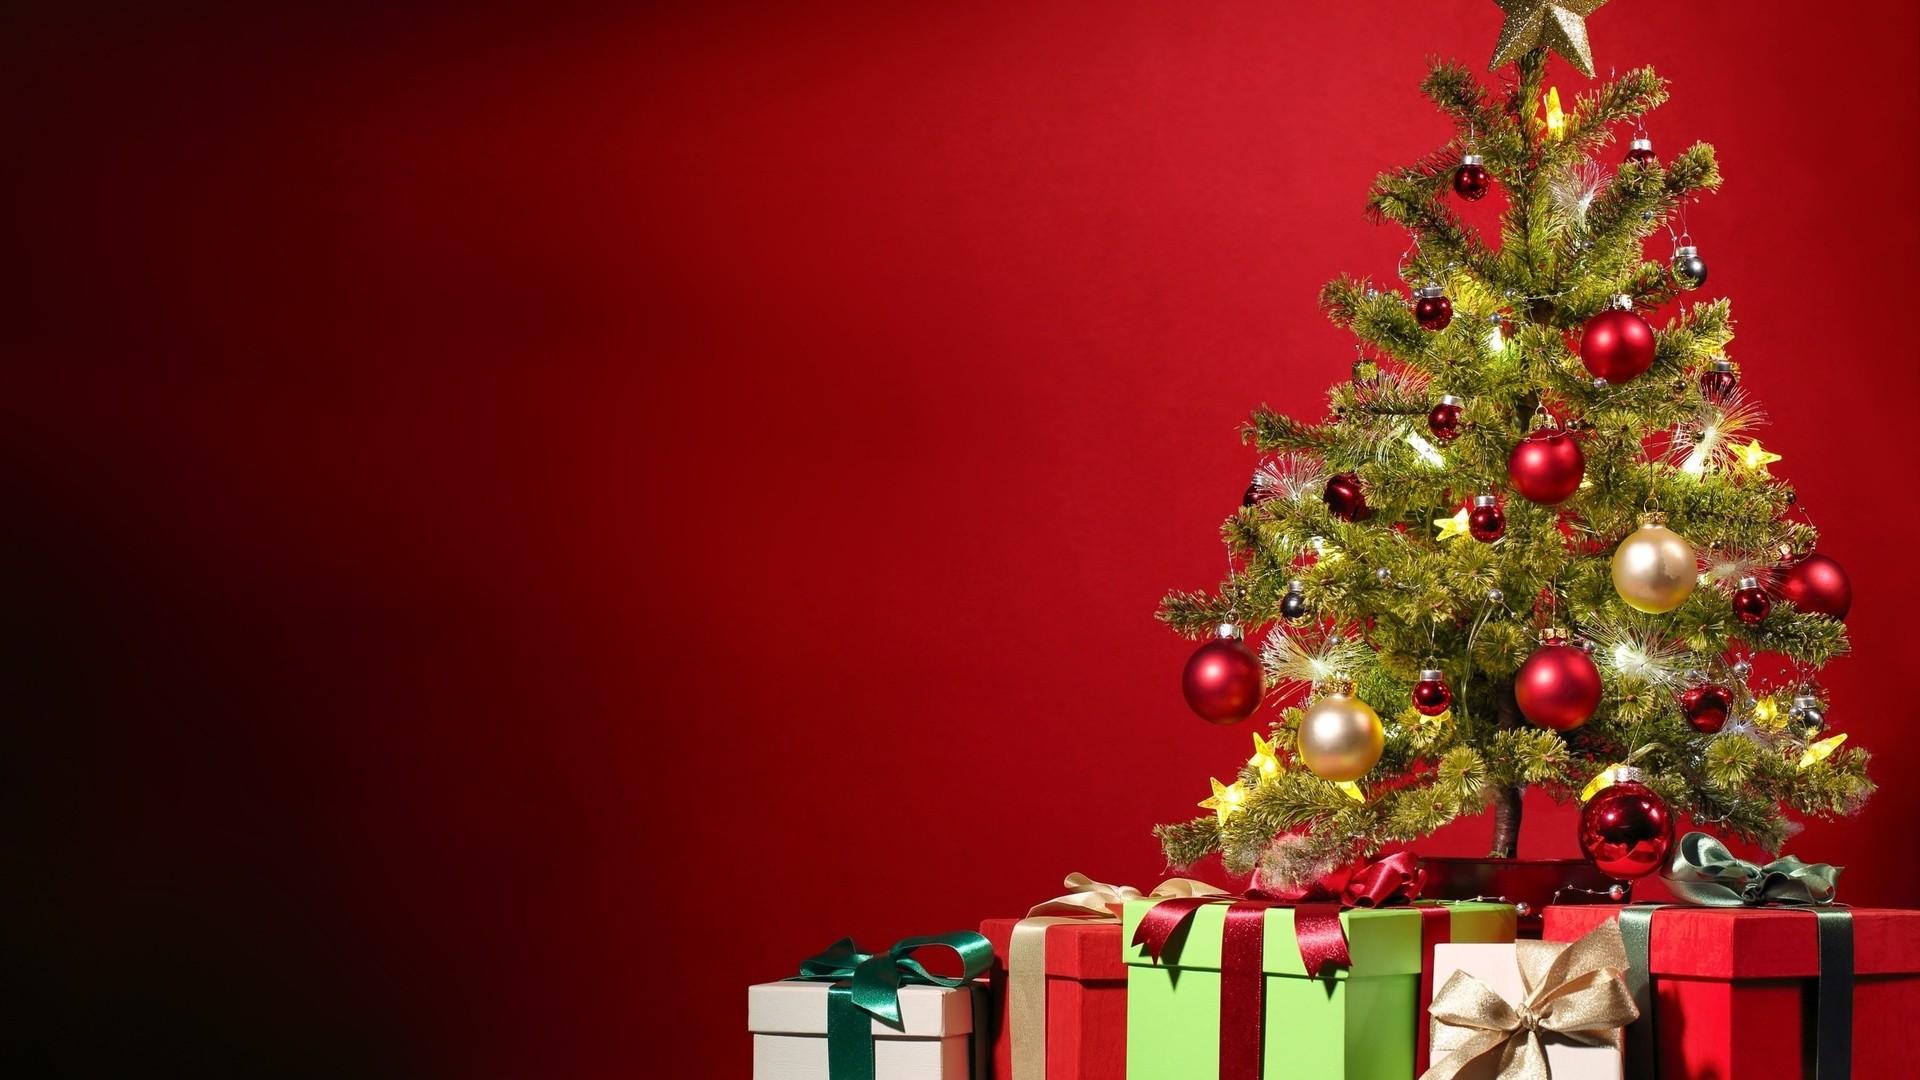 Merry Christmas tree download wallpaper   2018 1920x1080